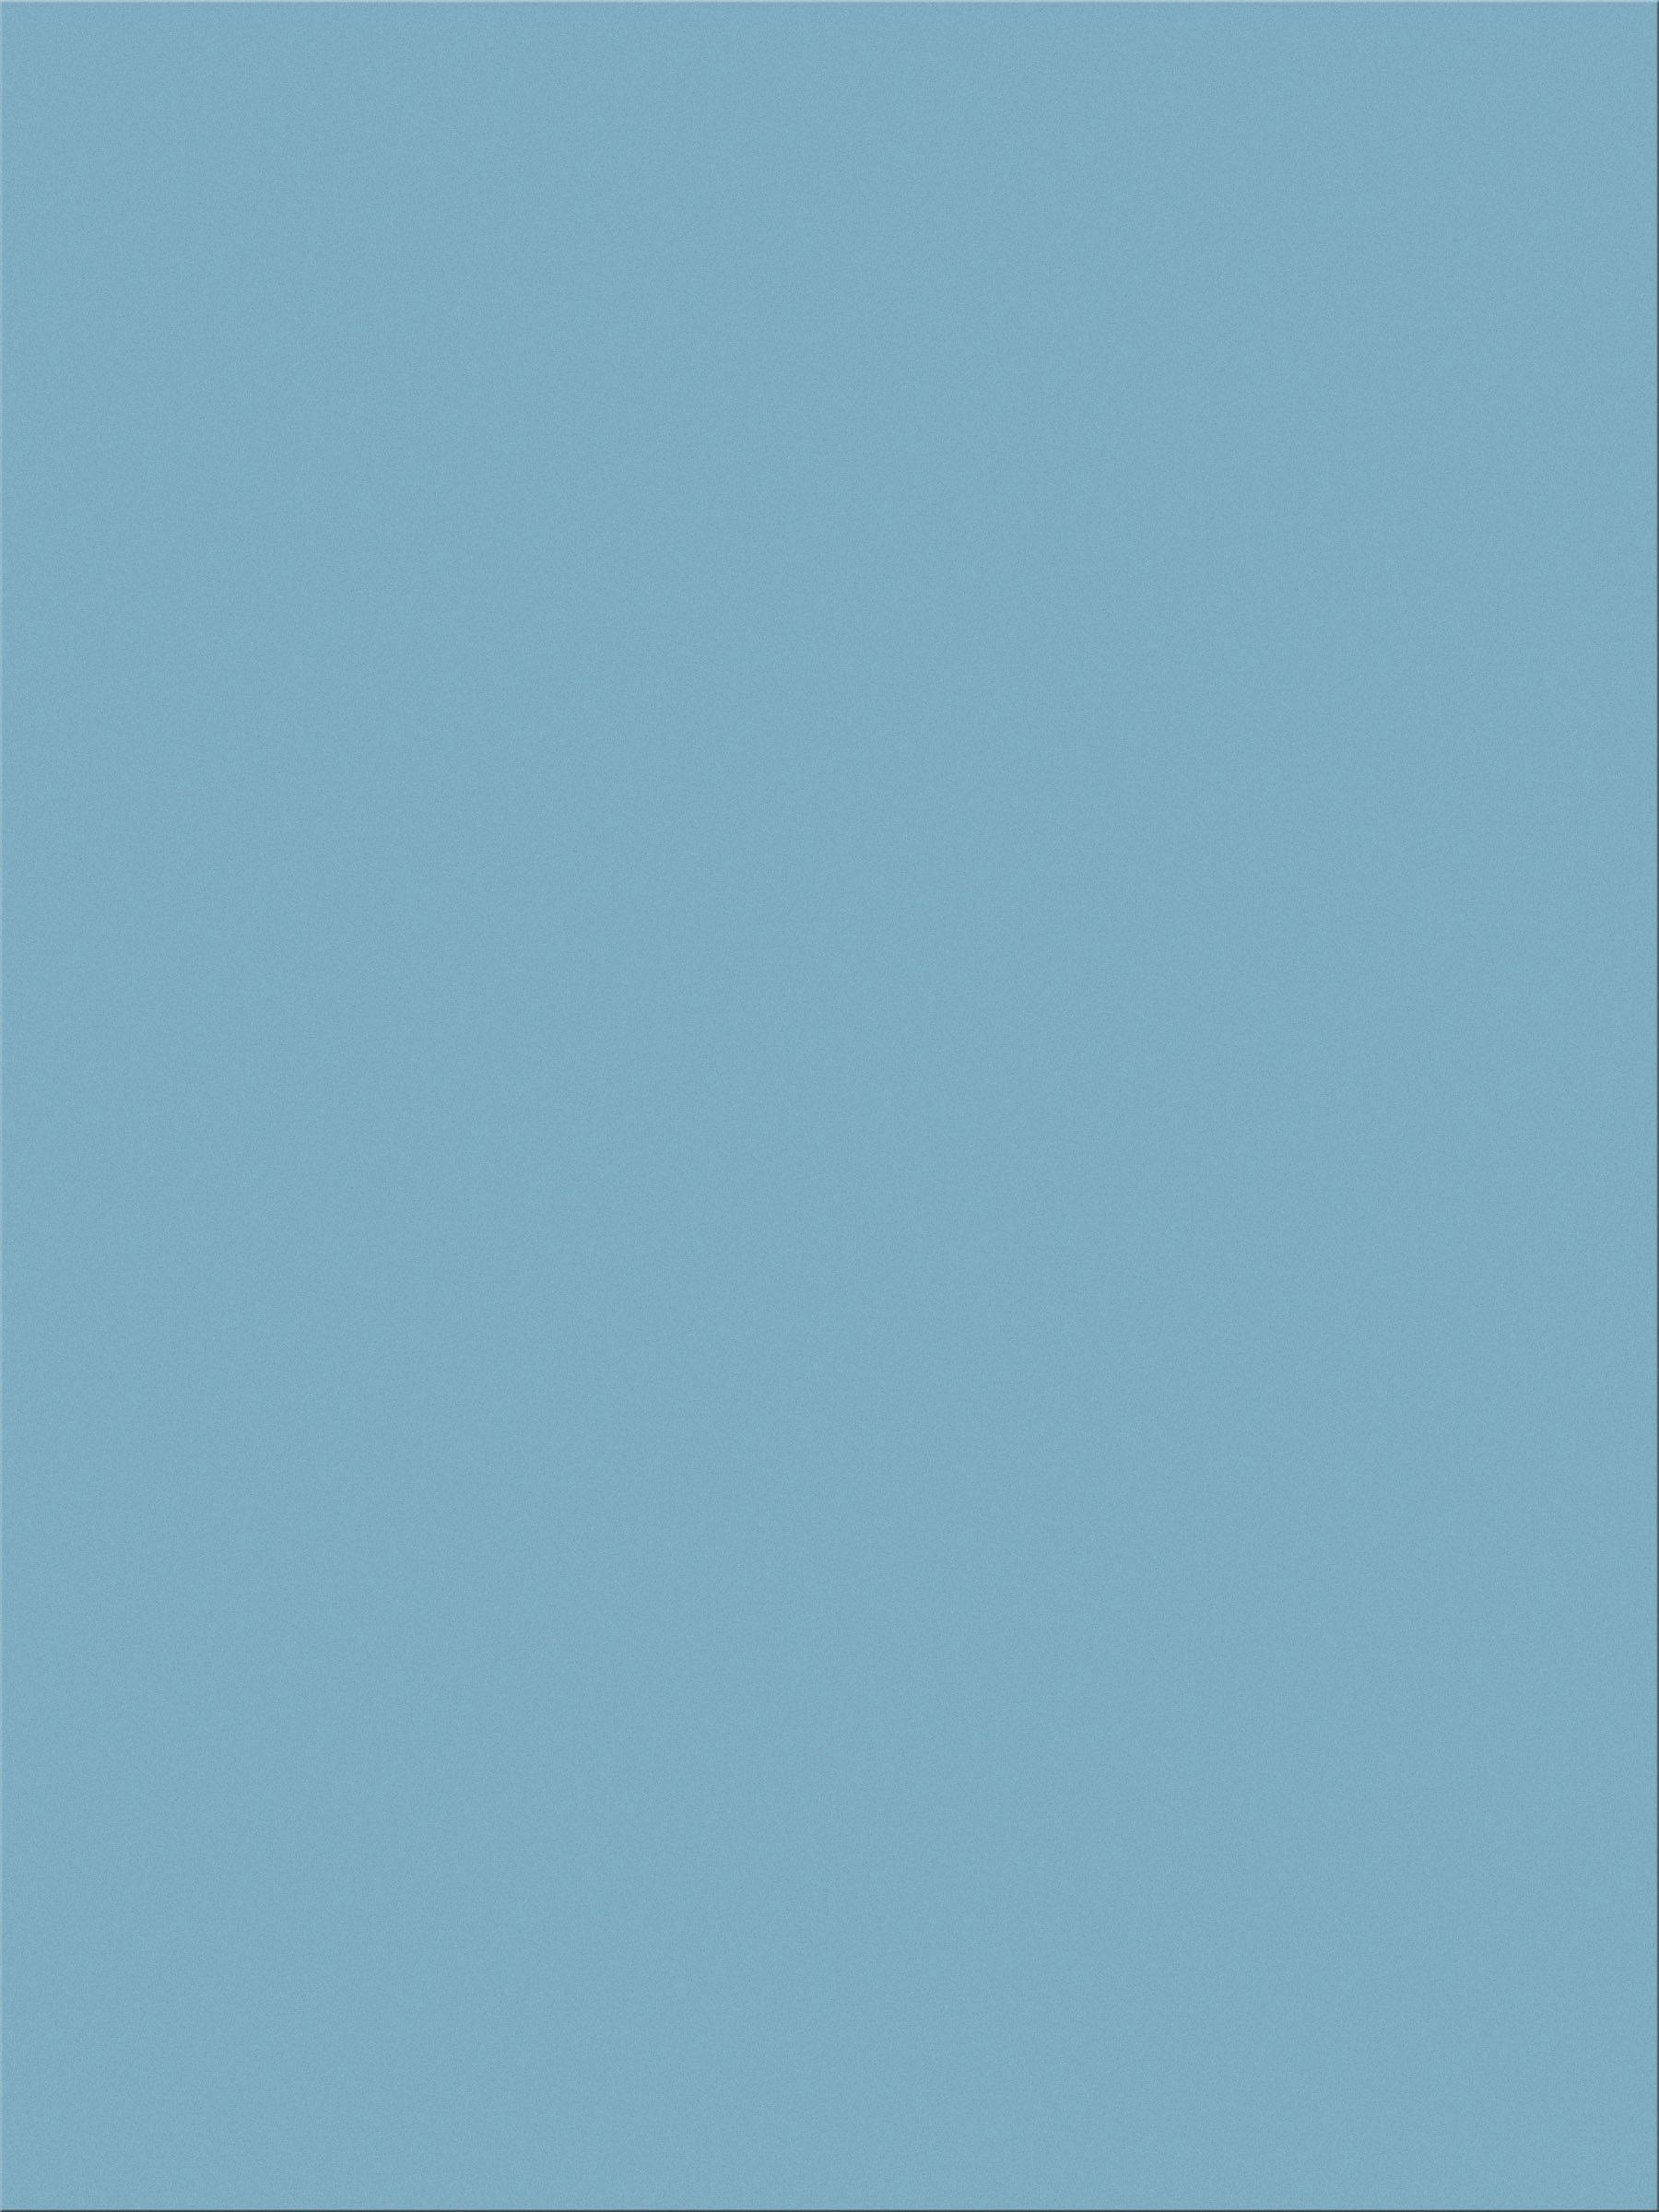 Pacon SunWorks Construction Paper, 9'' x 12'', 100-Count, Sky Blue (7604)